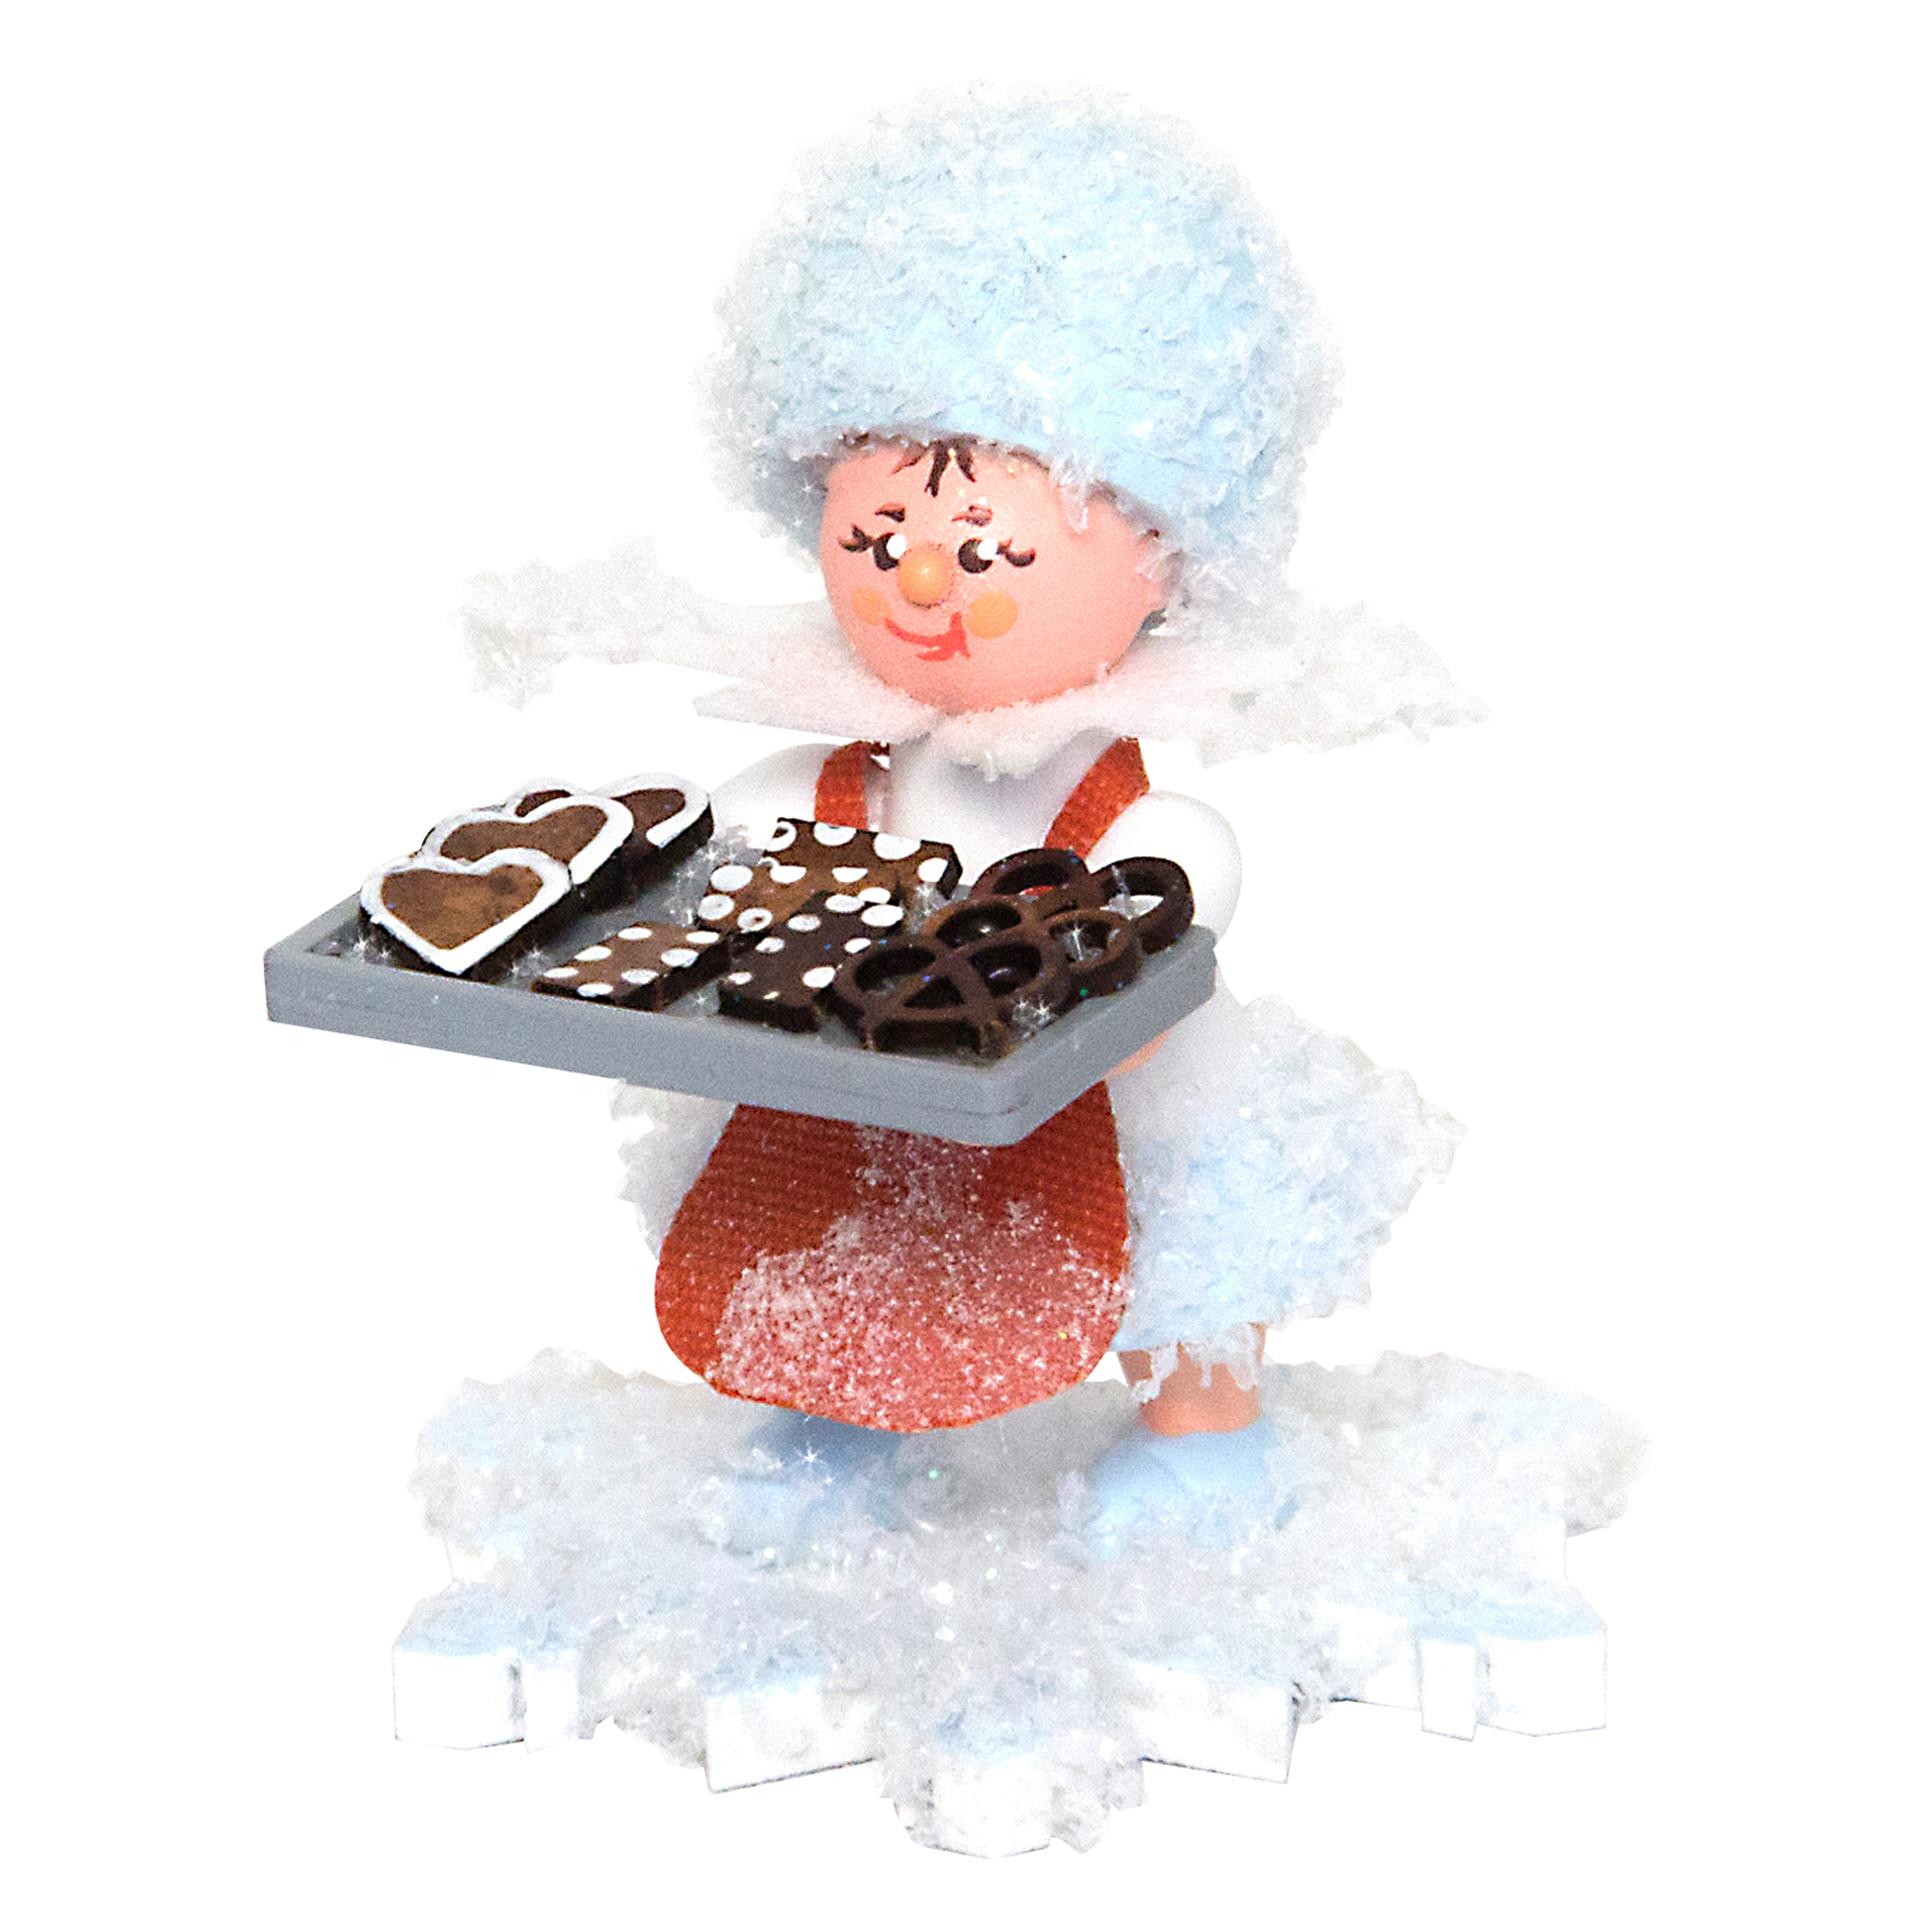 Schneeflöckchen Lebkuchenbäcker